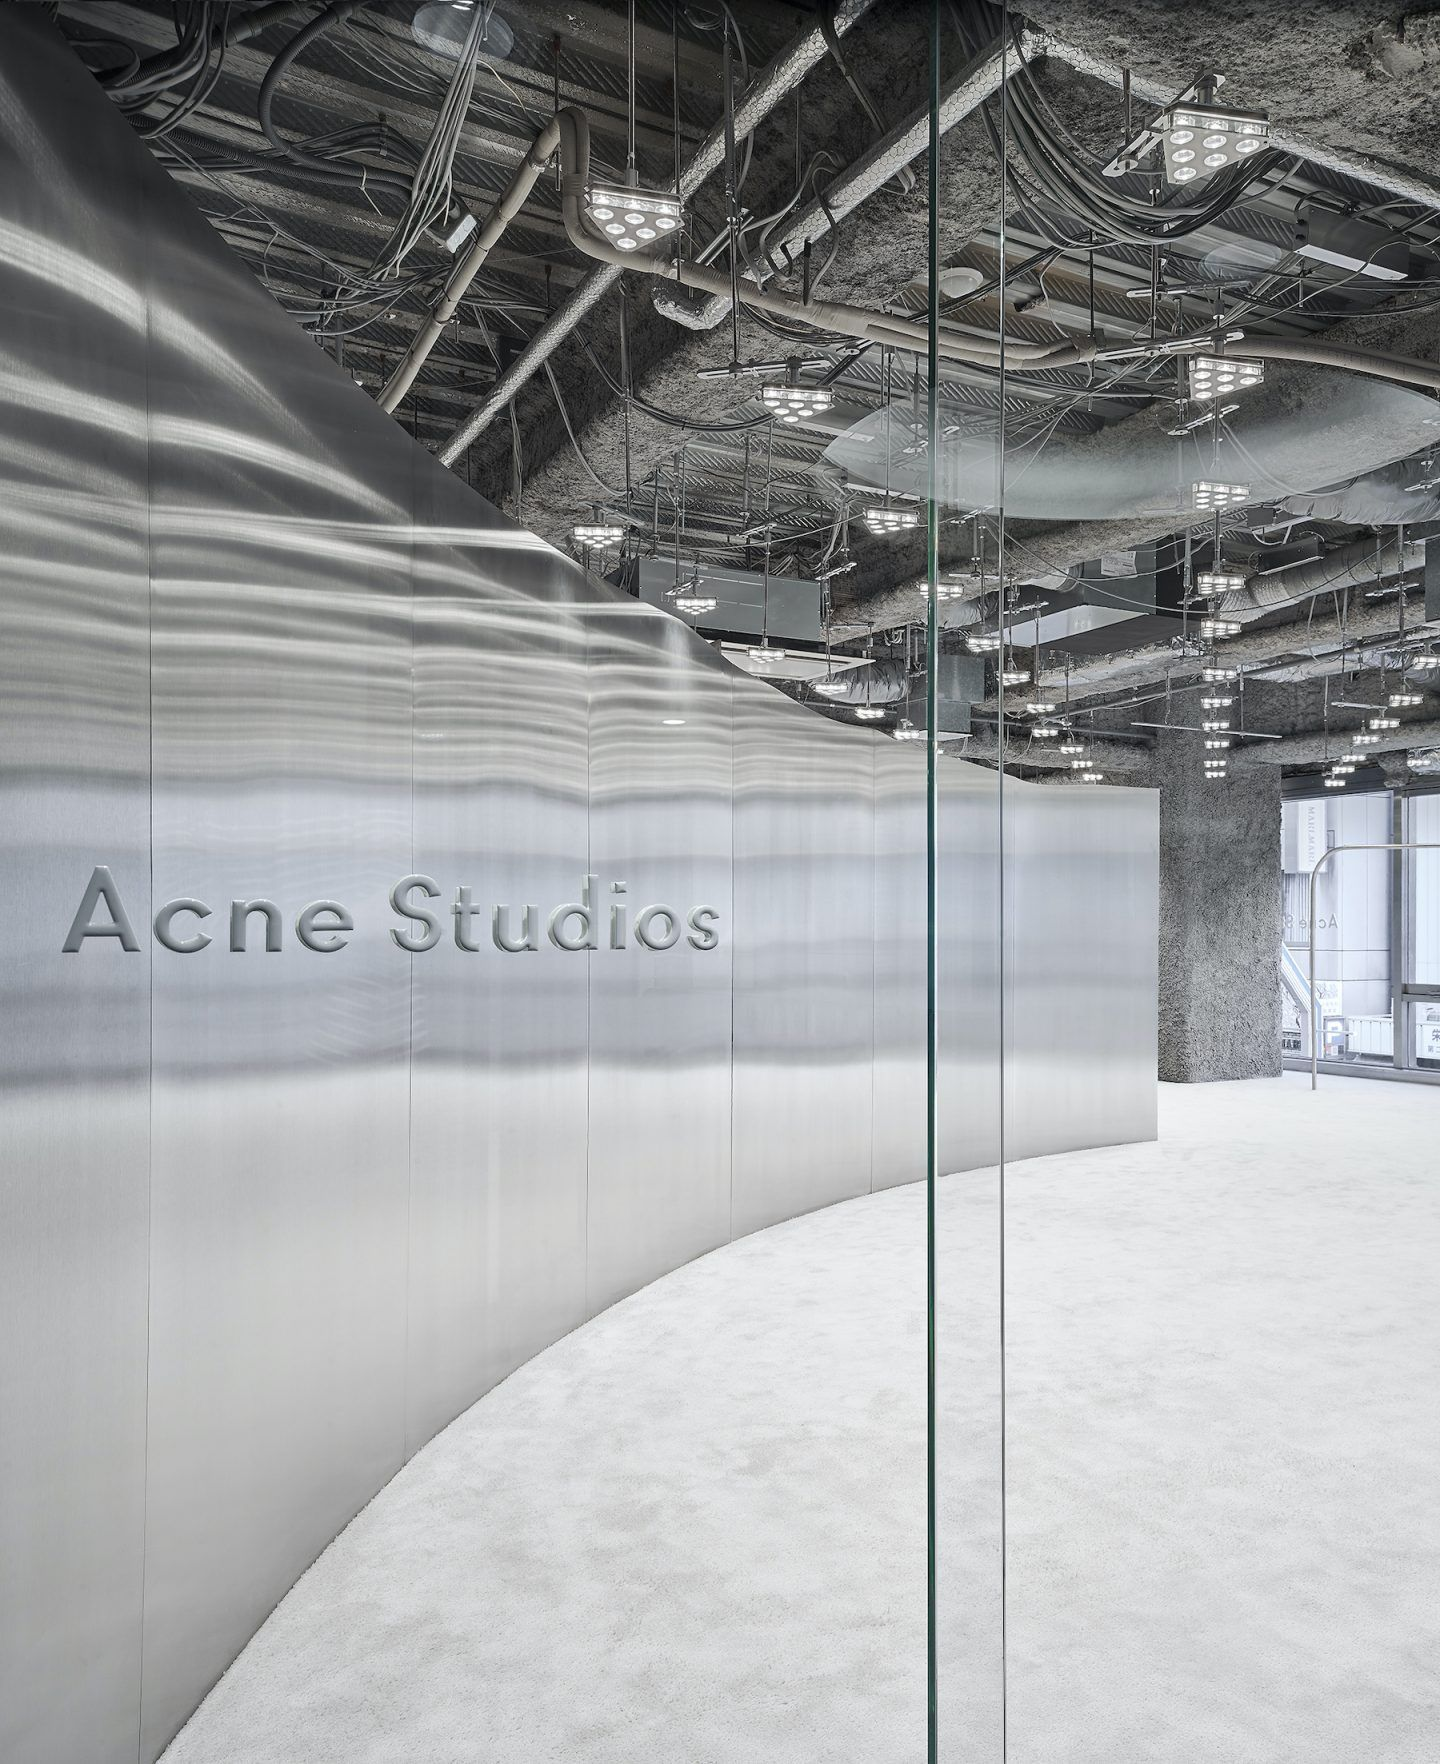 IGNANT-Design-Architectura-G-Acne-Studios-Nagoya-01